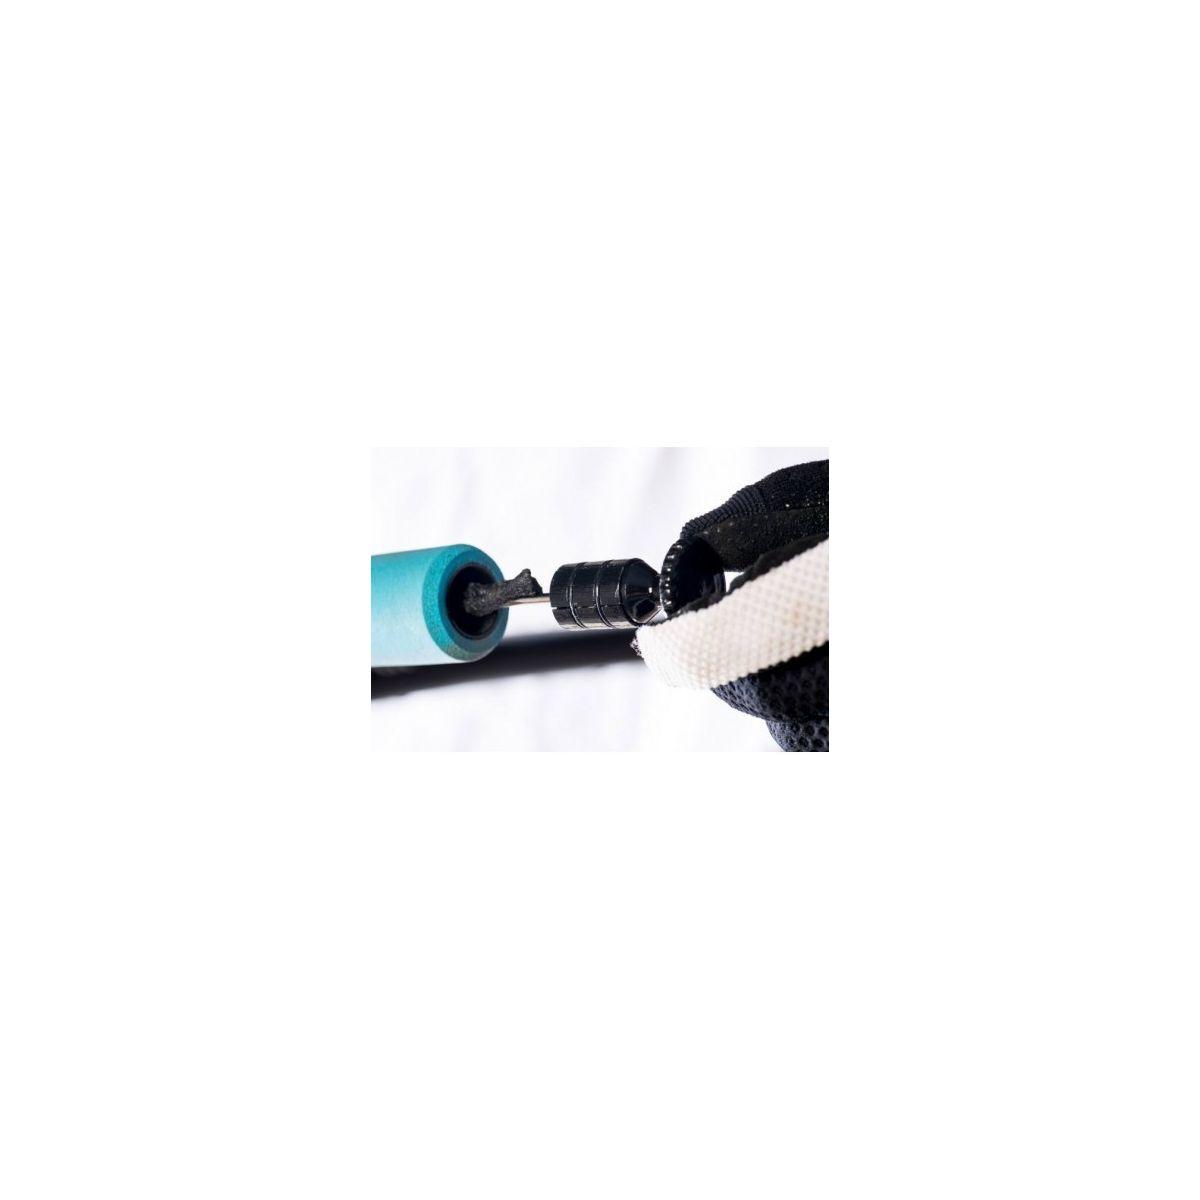 6abd09676b4 Tapon de manillar Kit de reparación tubeless Sahmurai Sword